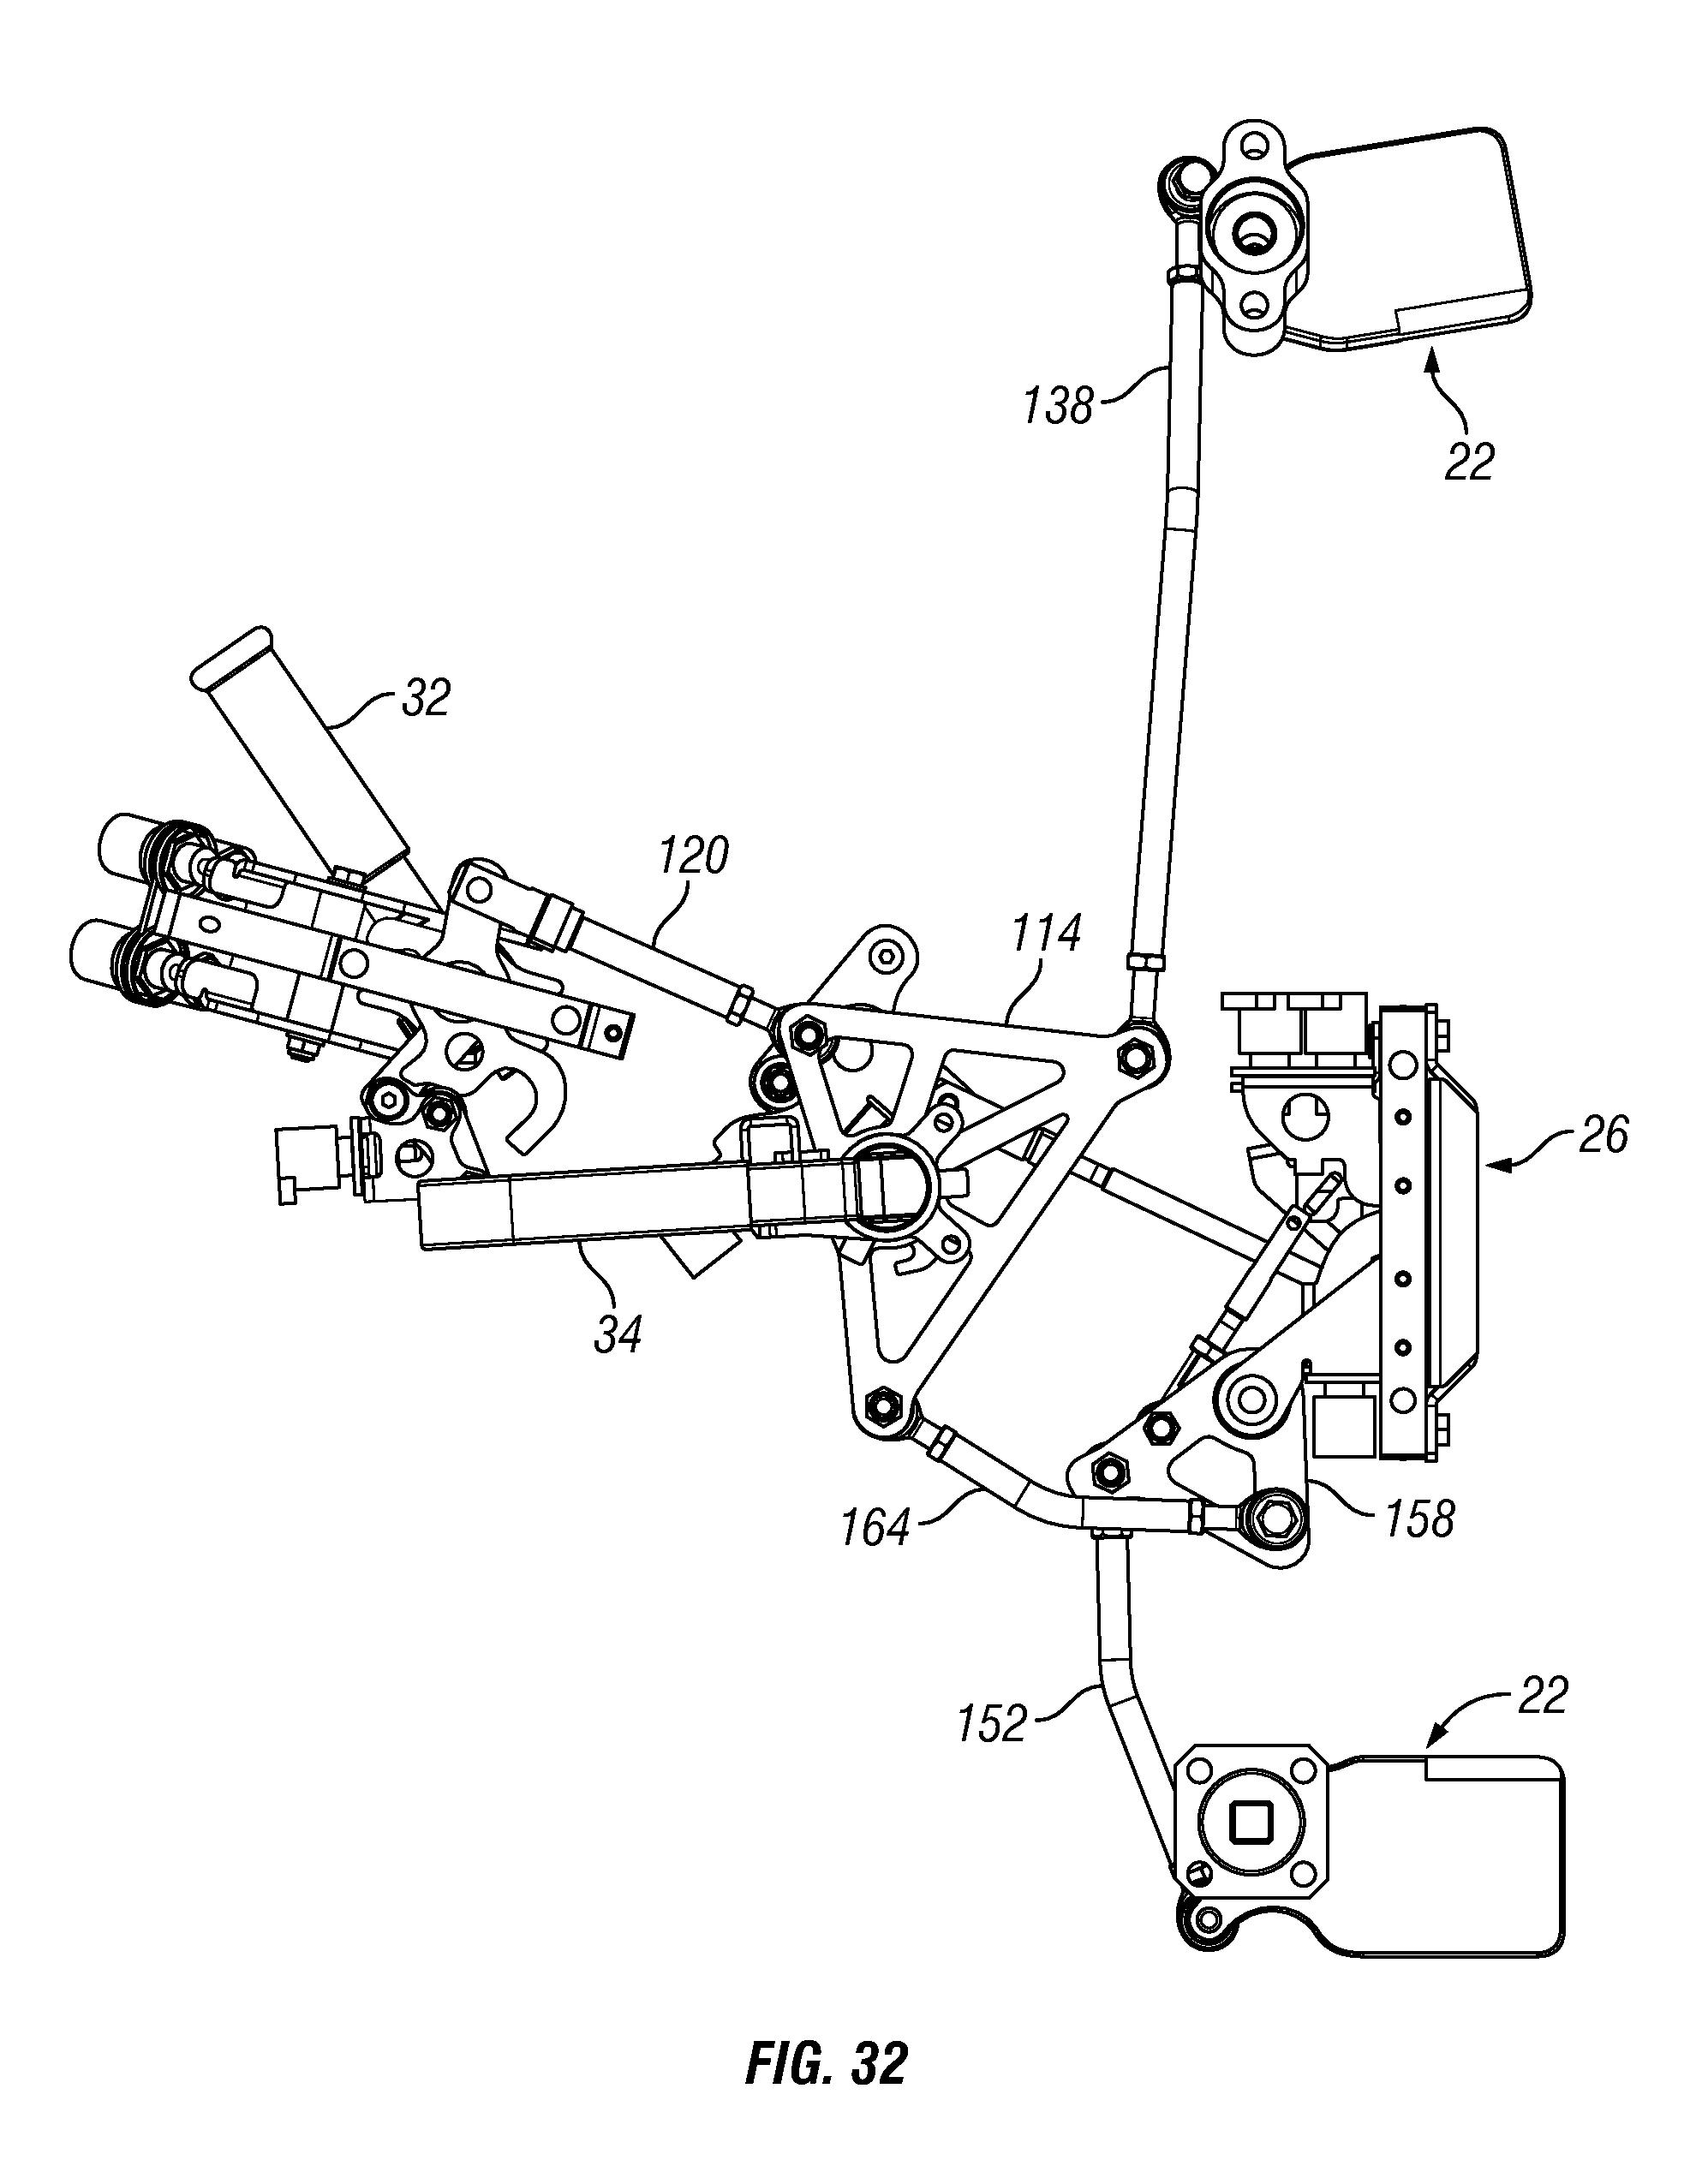 Suzuki Katana 600 Wiring Diagram